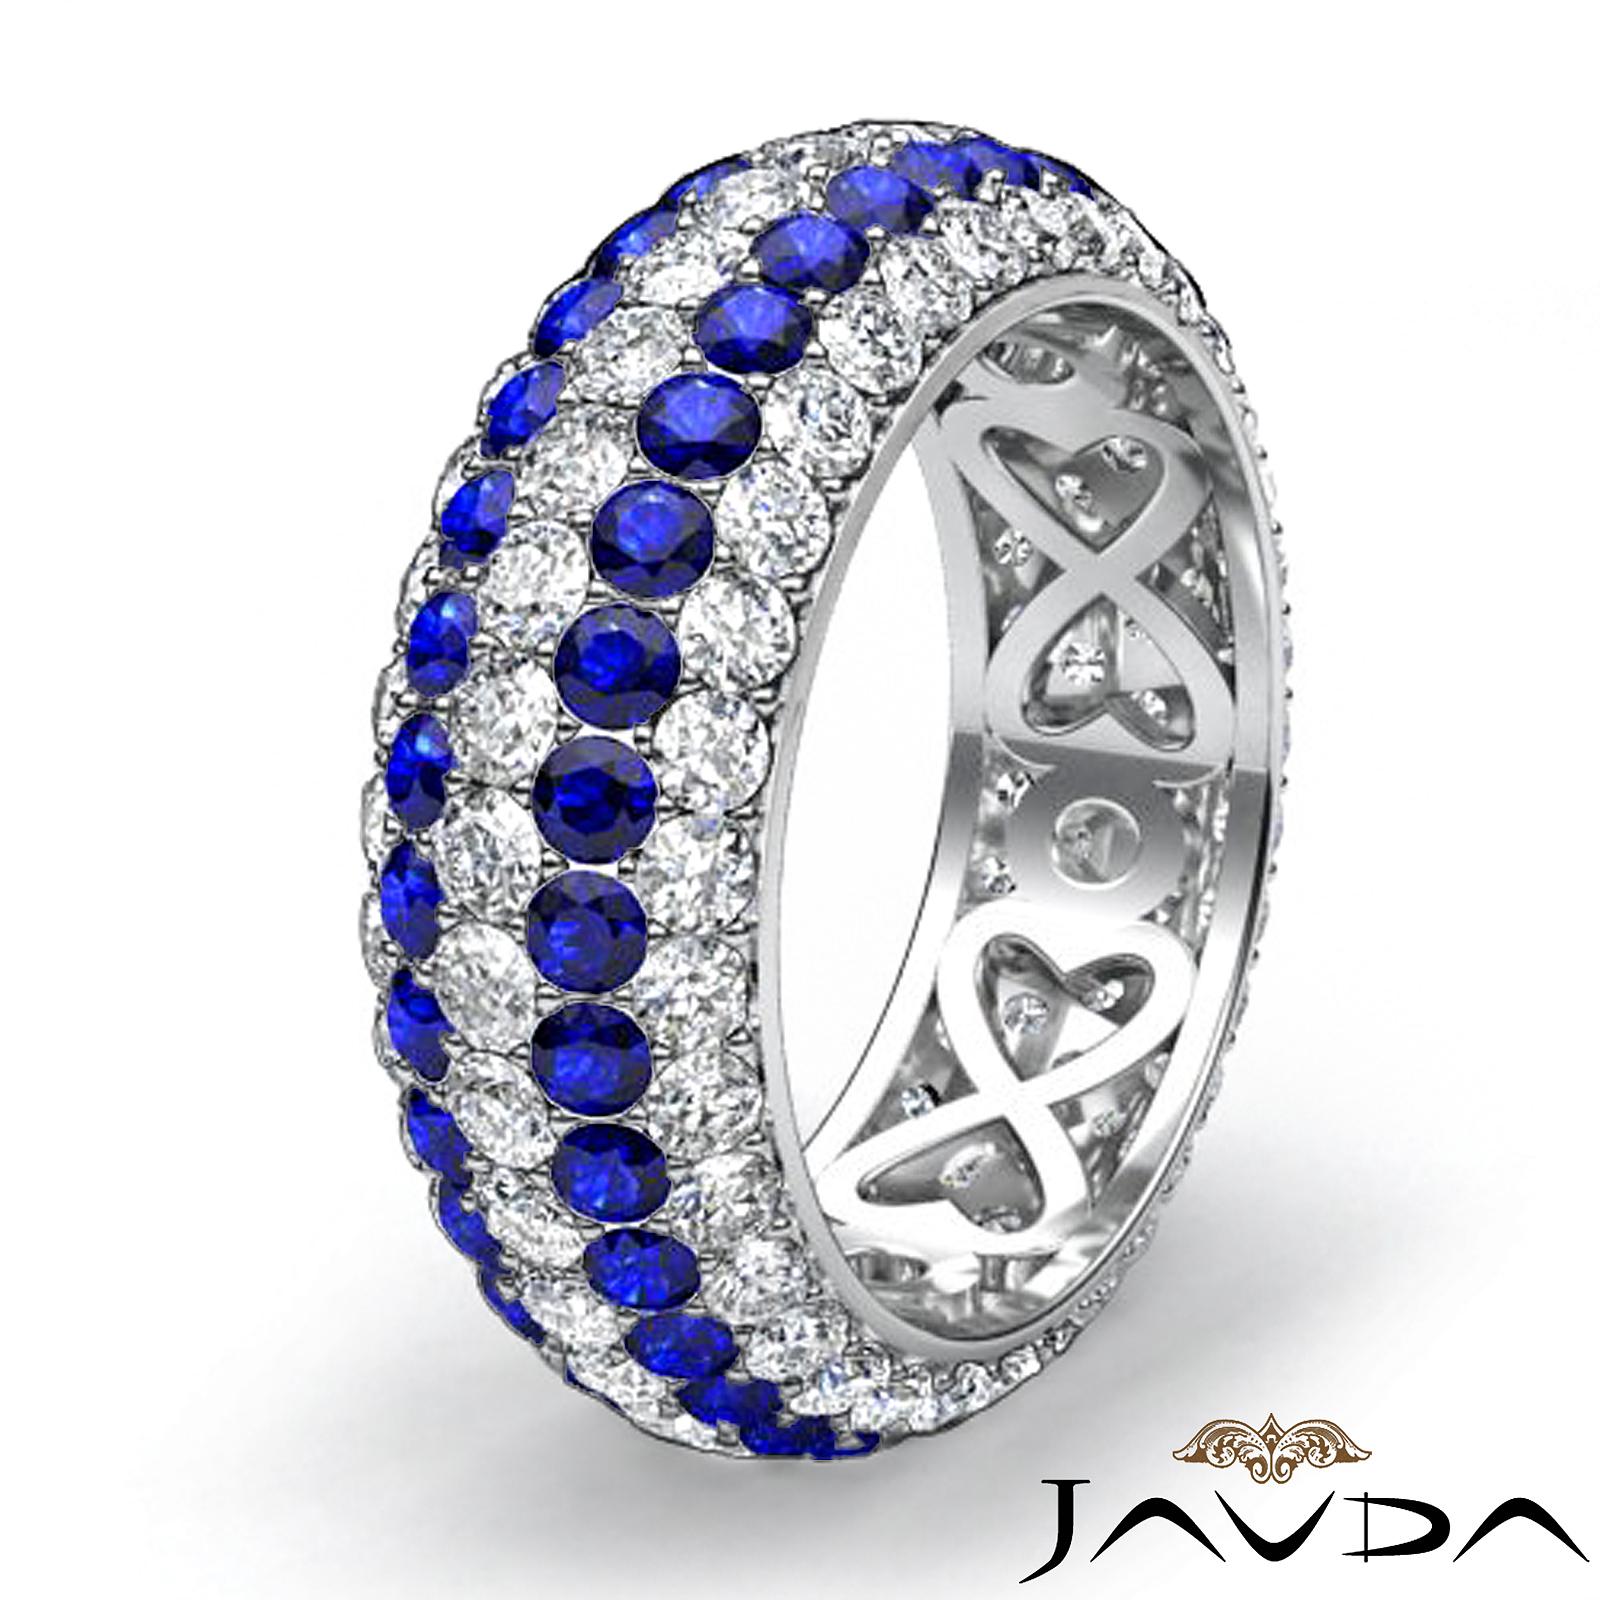 5 row eternity womens ring sapphire diamond anniversary. Black Bedroom Furniture Sets. Home Design Ideas